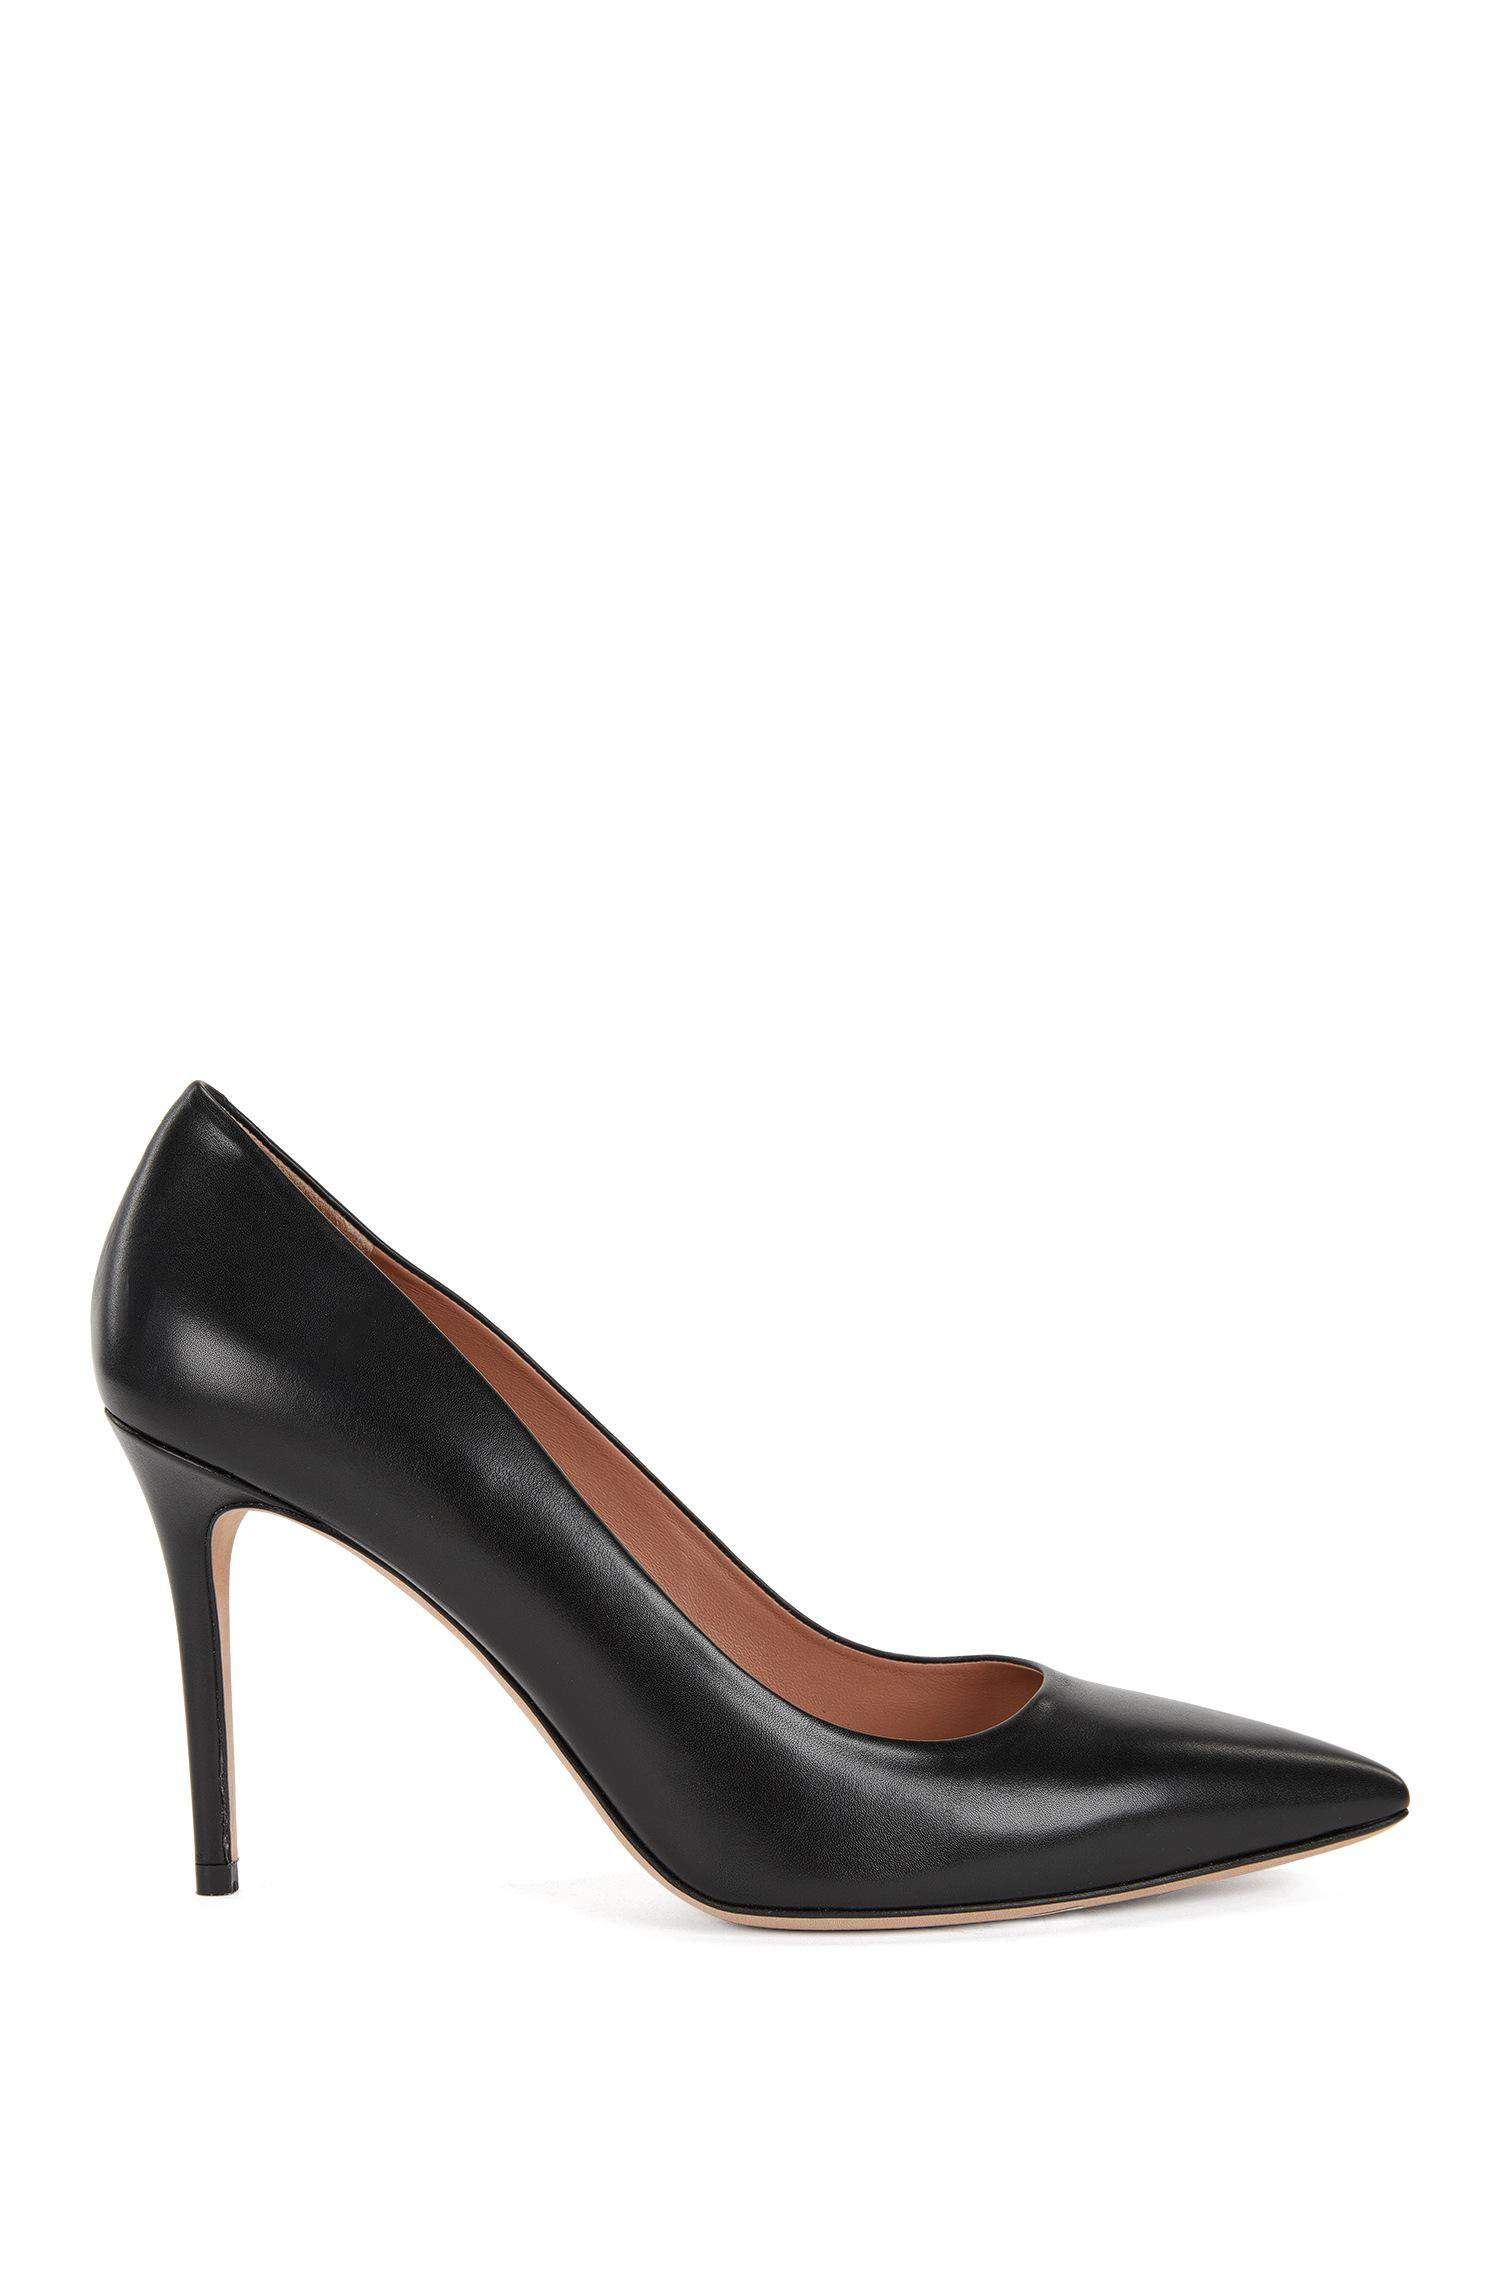 Pointed-toe court shoes in Italian leather HUGO BOSS MTOaUe